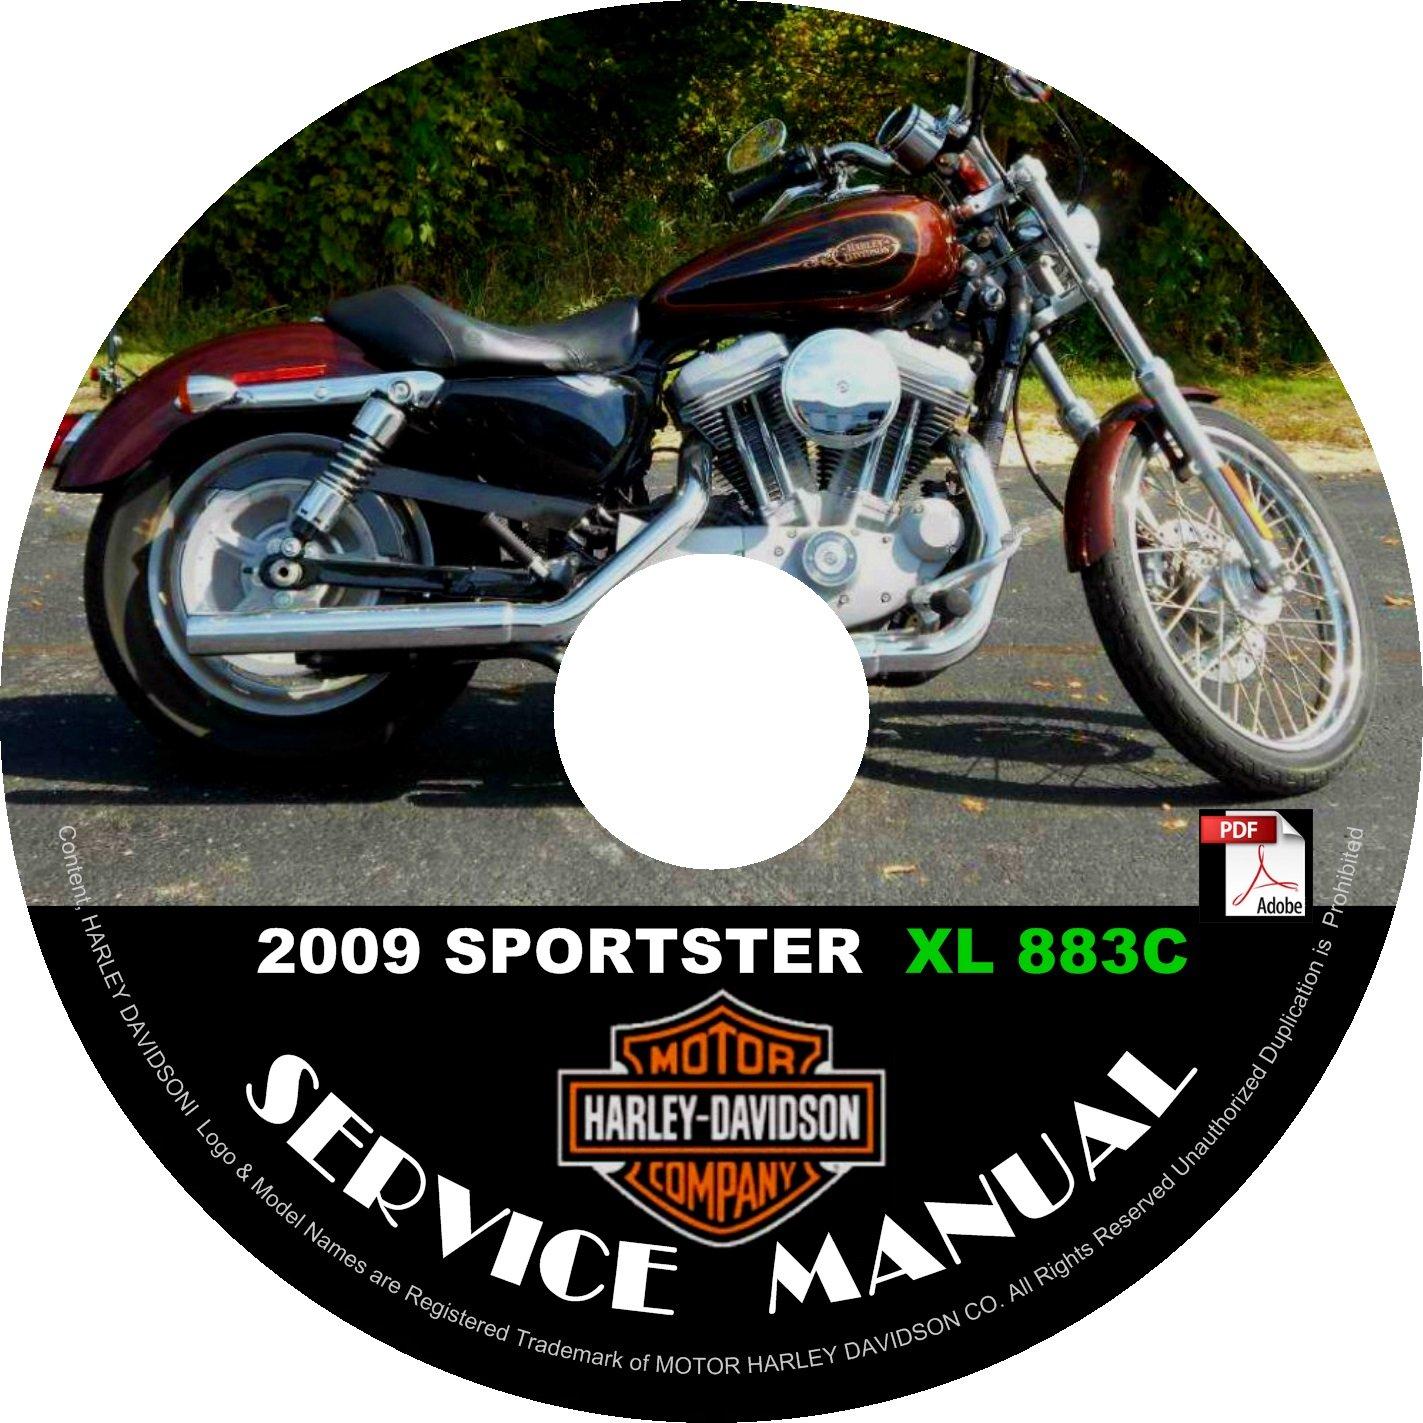 2009 Harley Davidson SPORTSTER XL 883C Service Repair Shop Manual on CD FiX Rebuild '09 Workshop